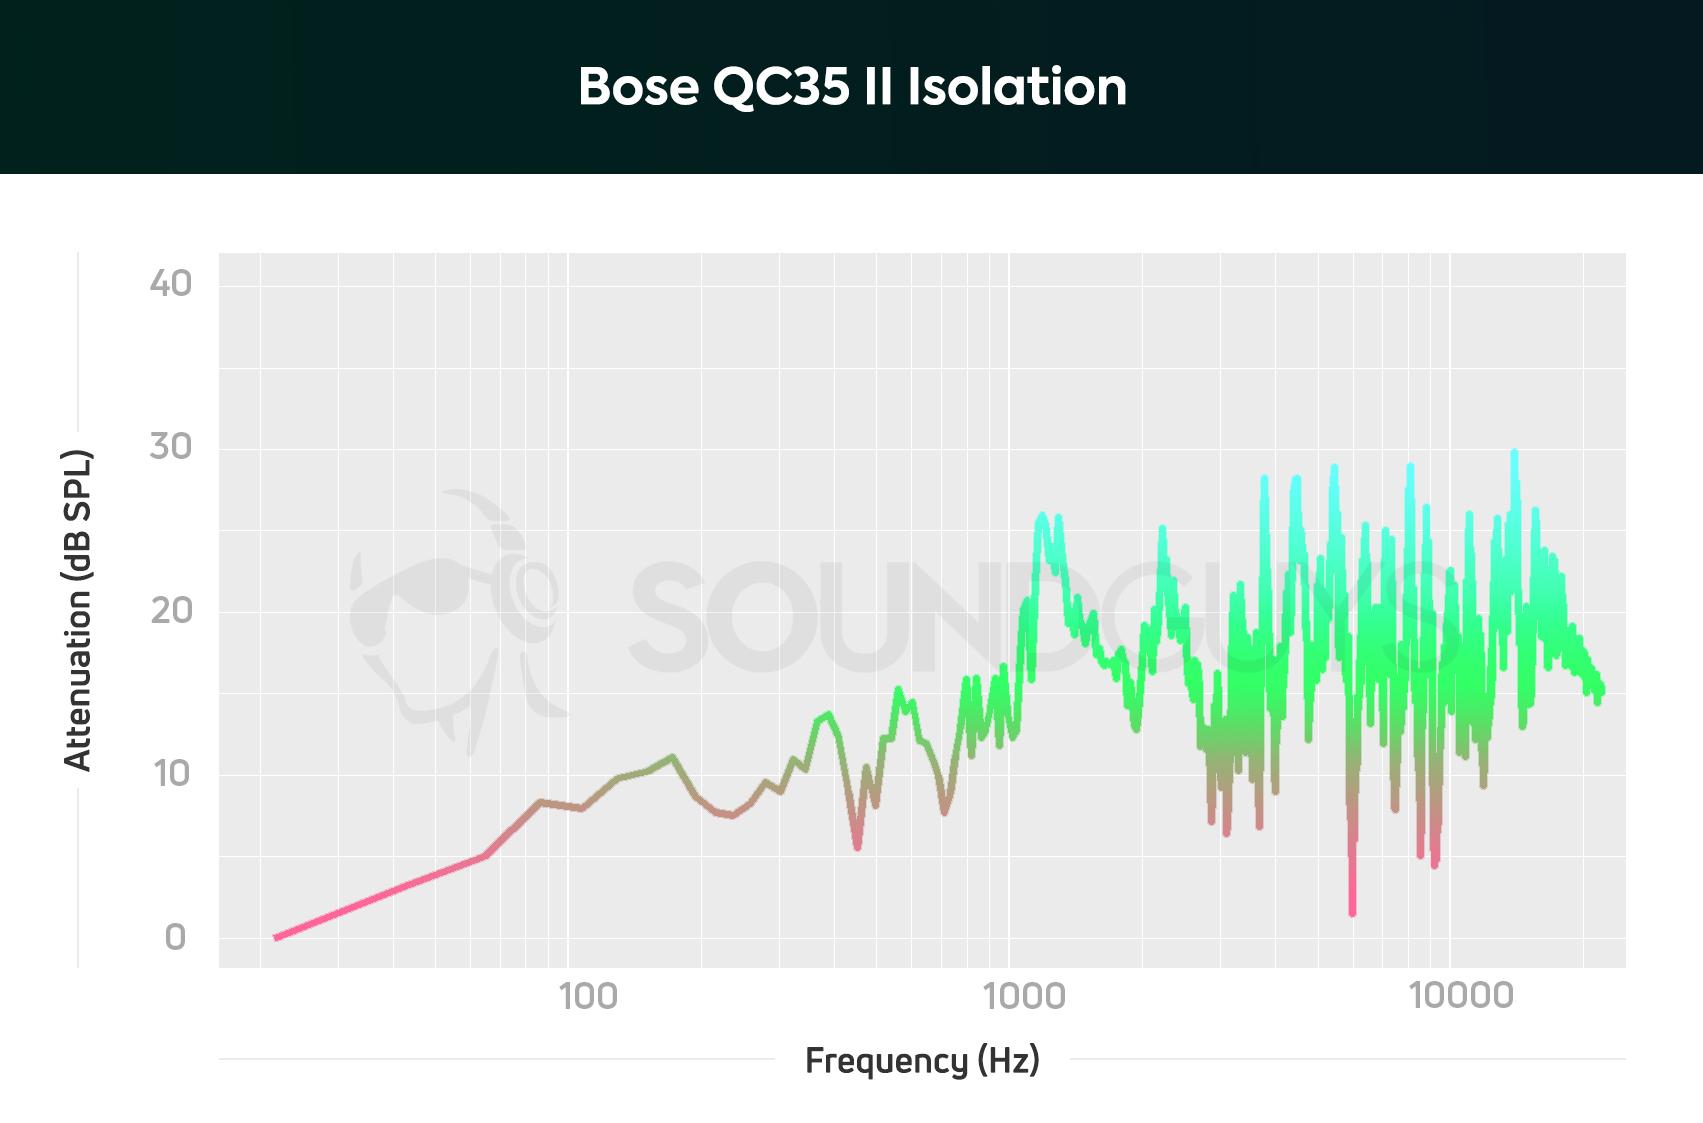 bose qc 35 firmware v3.0.3